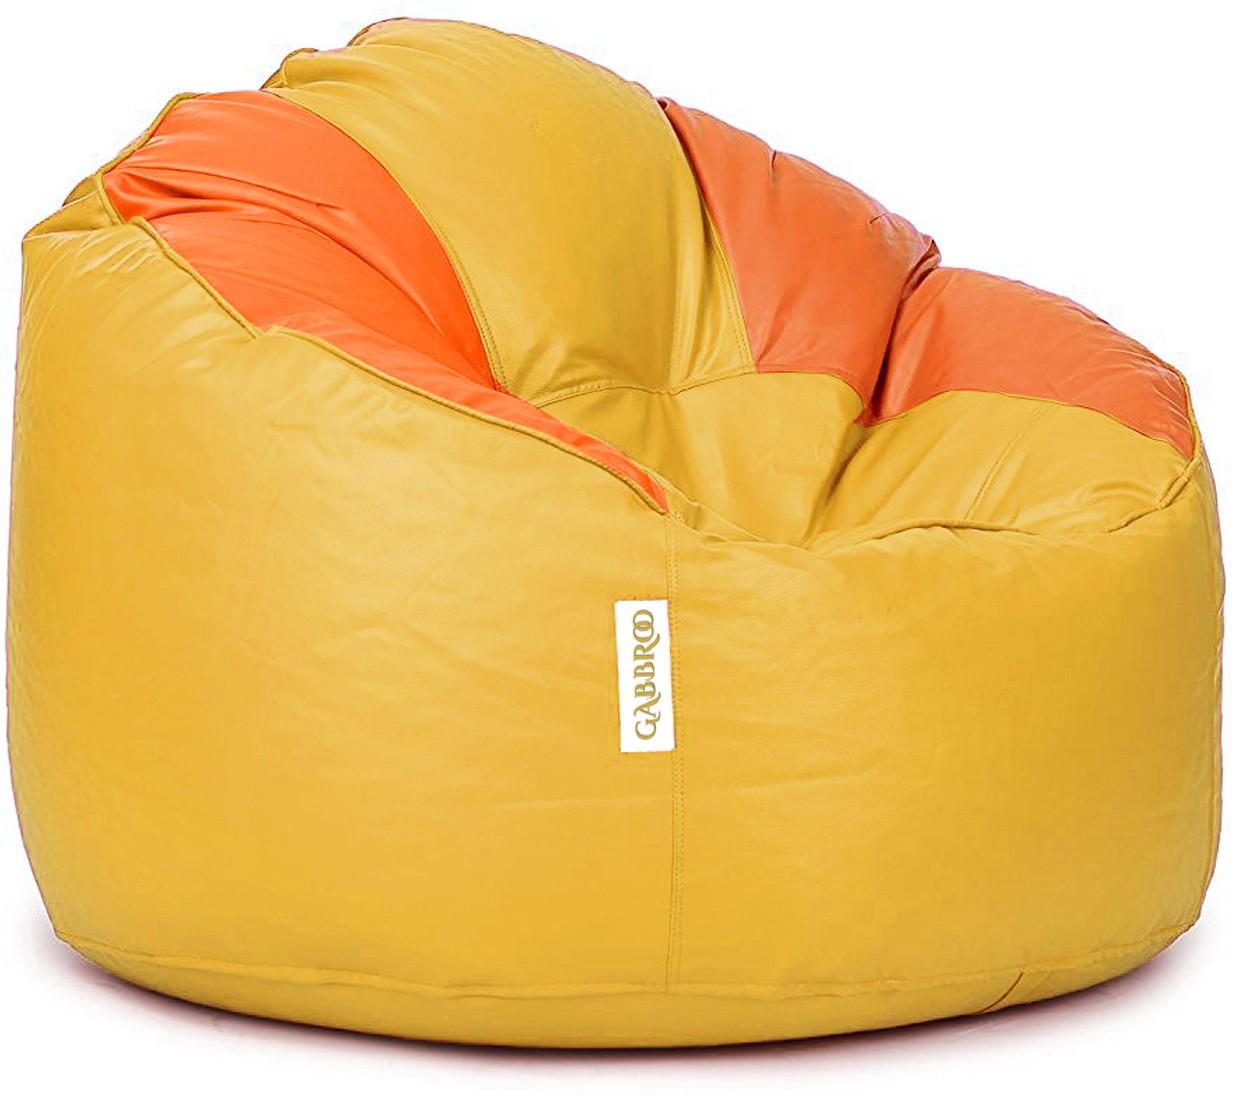 View Gabbroo XXXL Lounger Bean Bag Cover(Yellow, Orange) Furniture